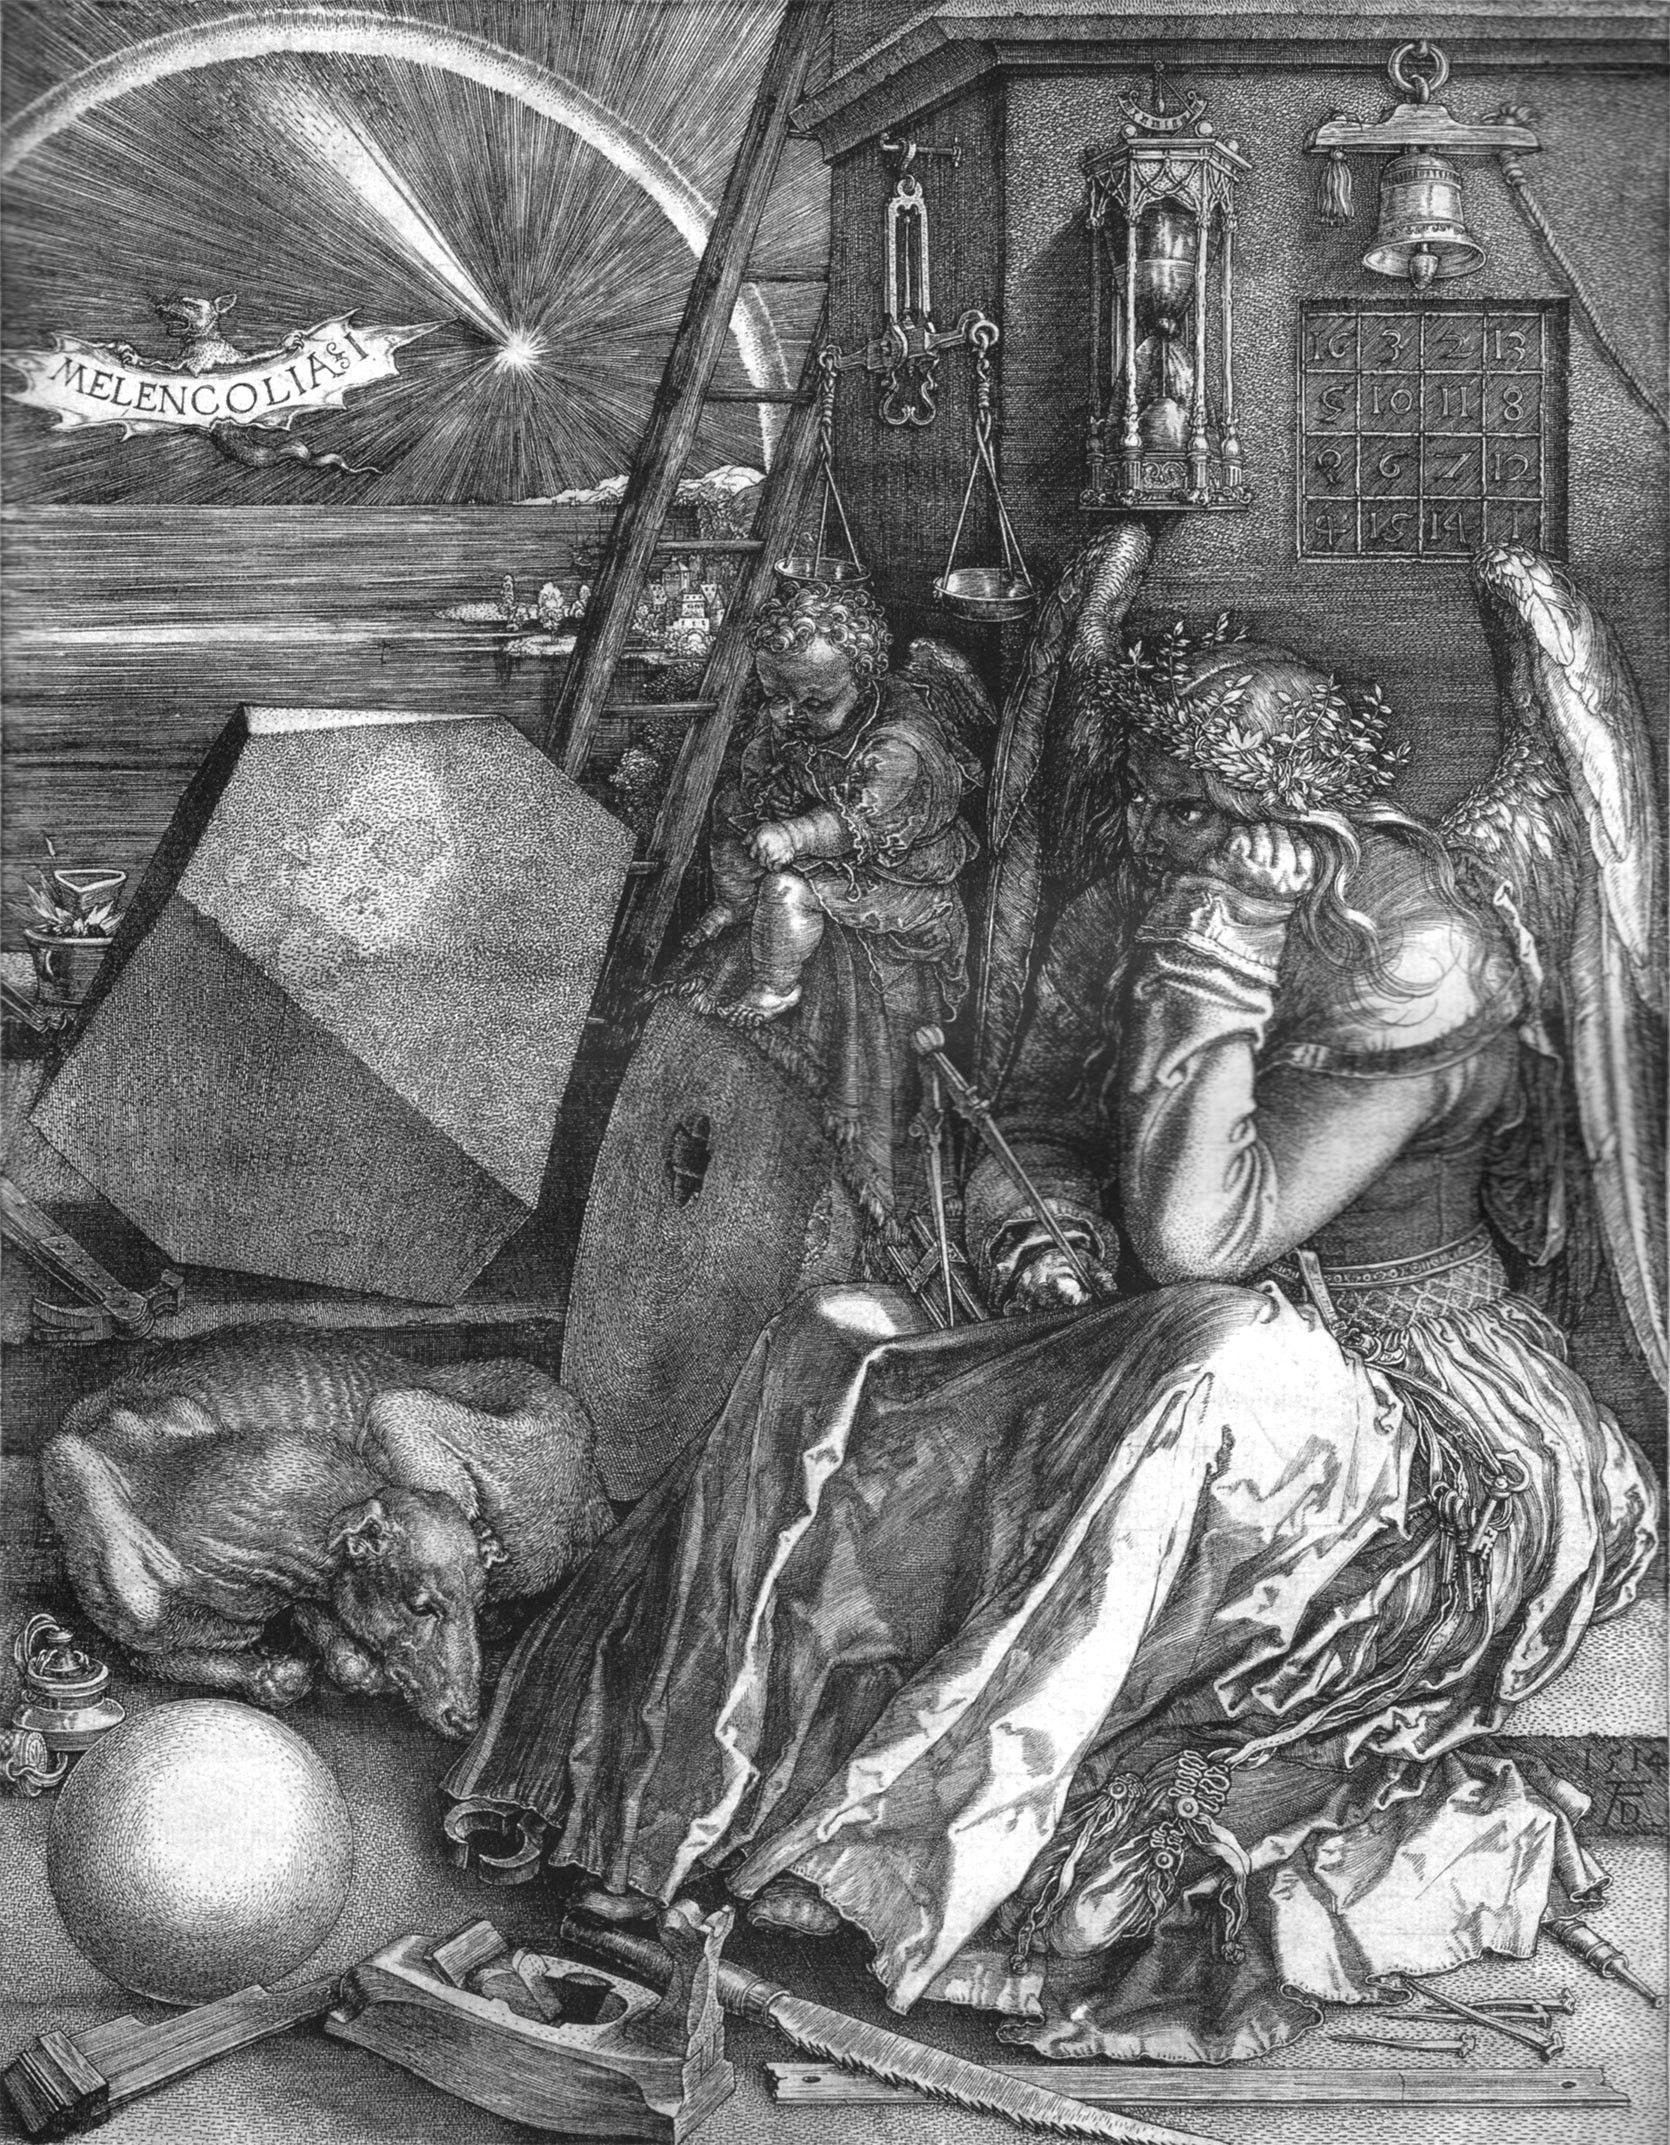 Albrecht Durer Melancholia 1514 Albrecht Durer Renaissance Kunst Holzarbeiten